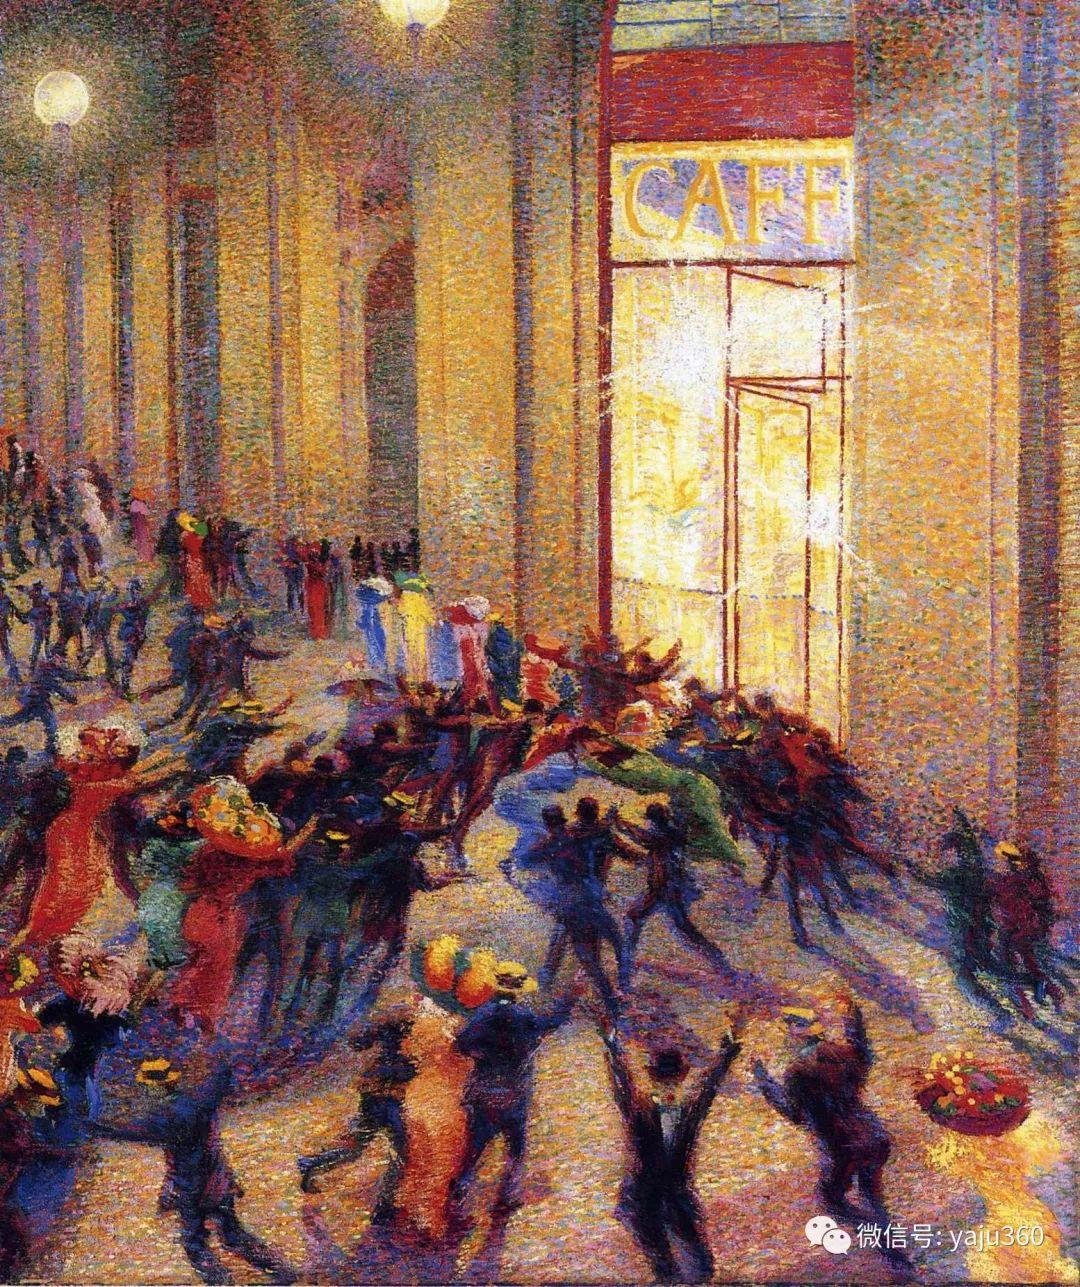 未来主义 意大利画家Umberto Boccioni插图27